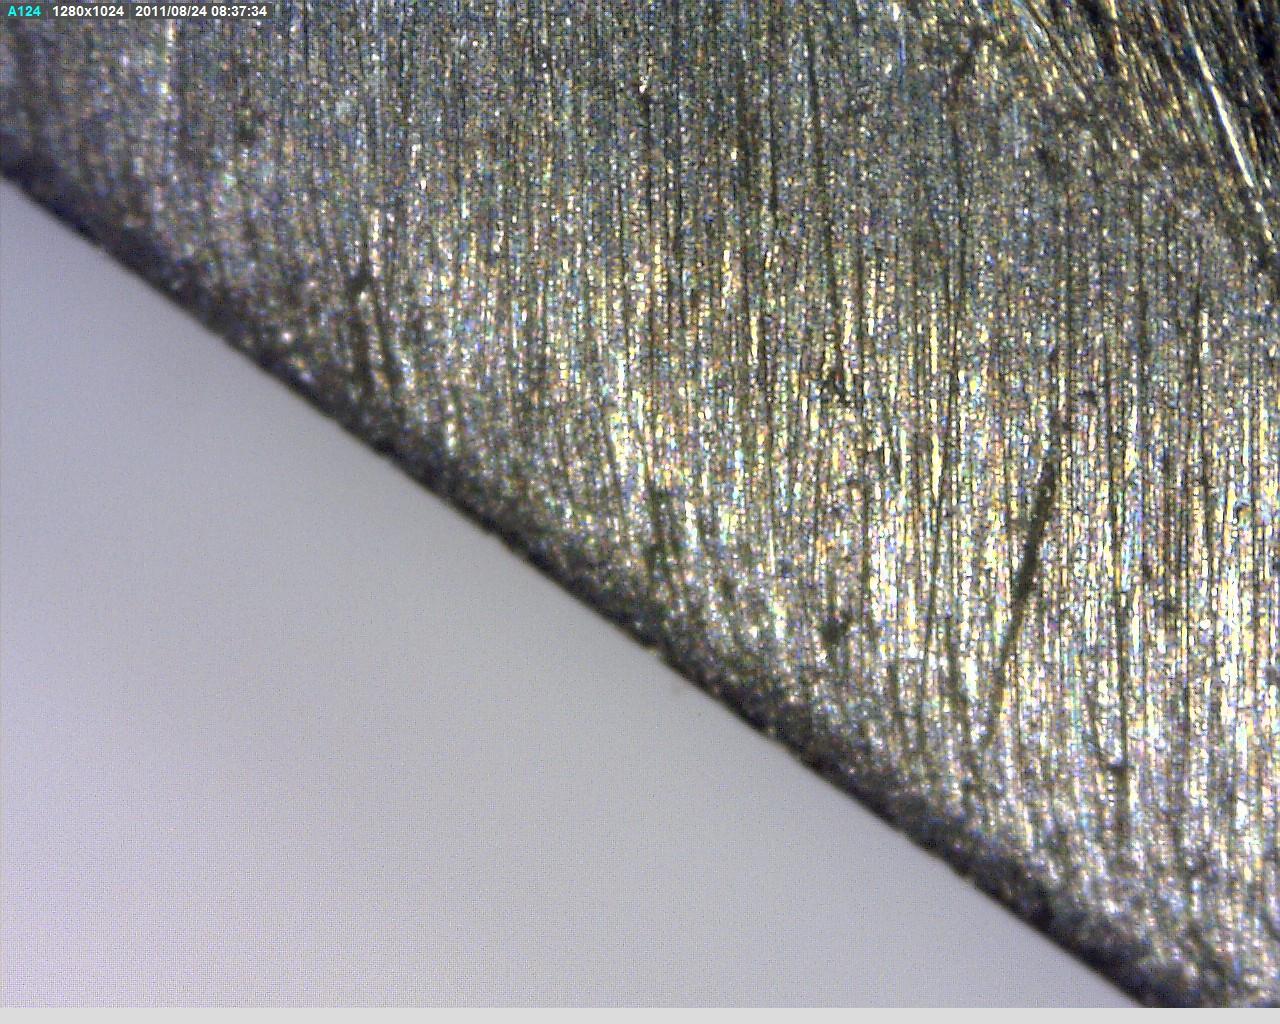 Shapton Stone Edge : Weps chosera stone progression wicked edge precision